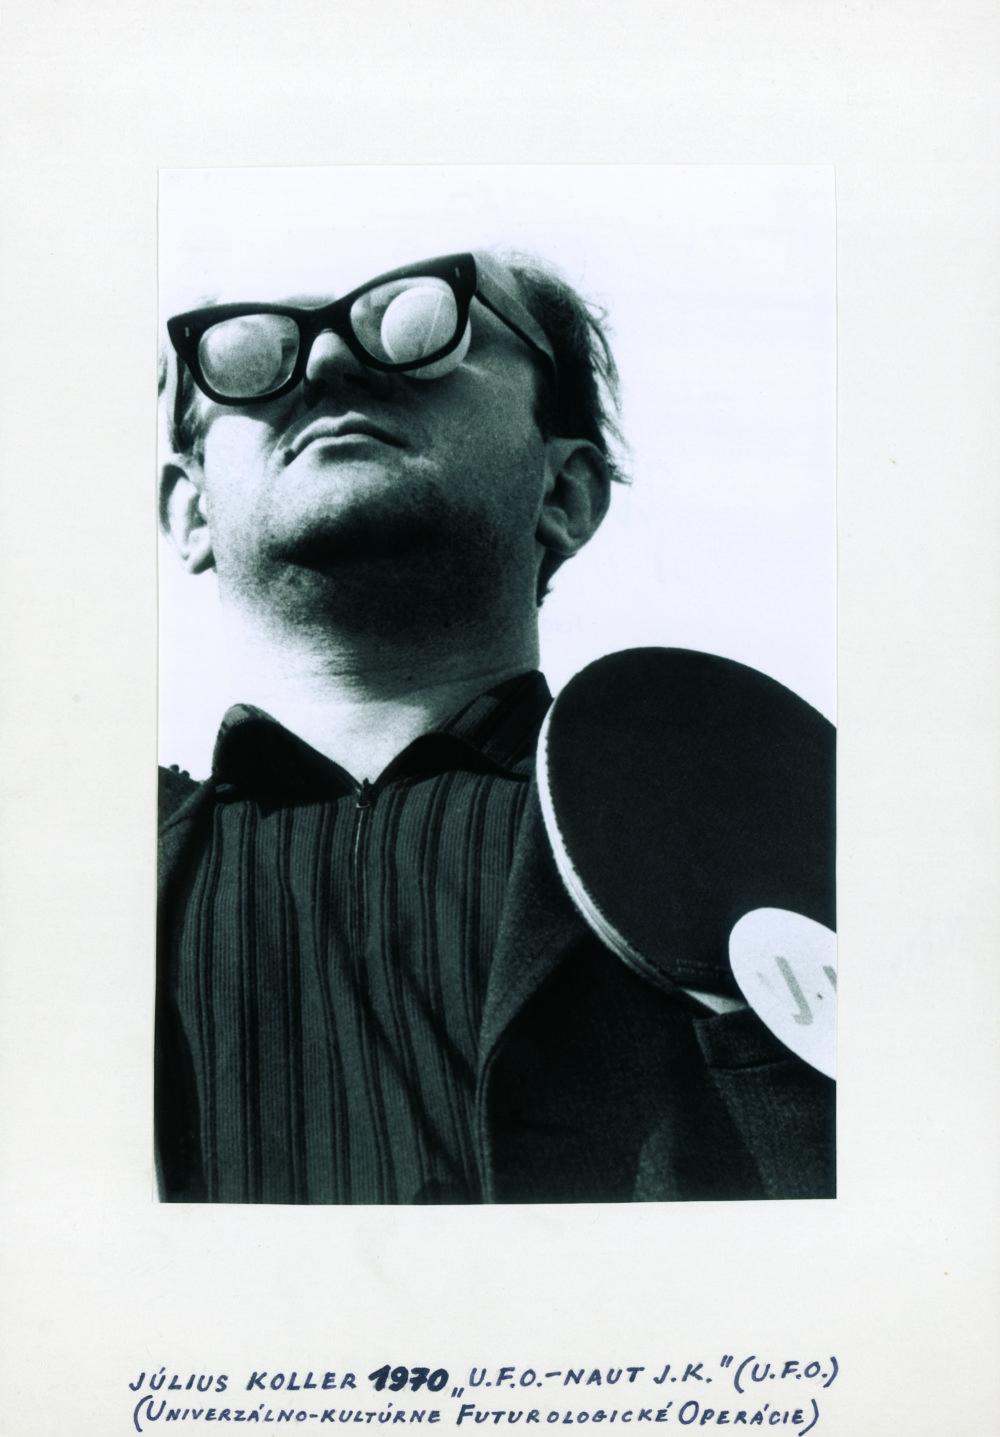 Július Koller U.F.O.-naut J.K. (U.F.O.), 1970 SW-Fotografie (Milan Sirkovský) Foto - Courtesy of Slovak National Gallery